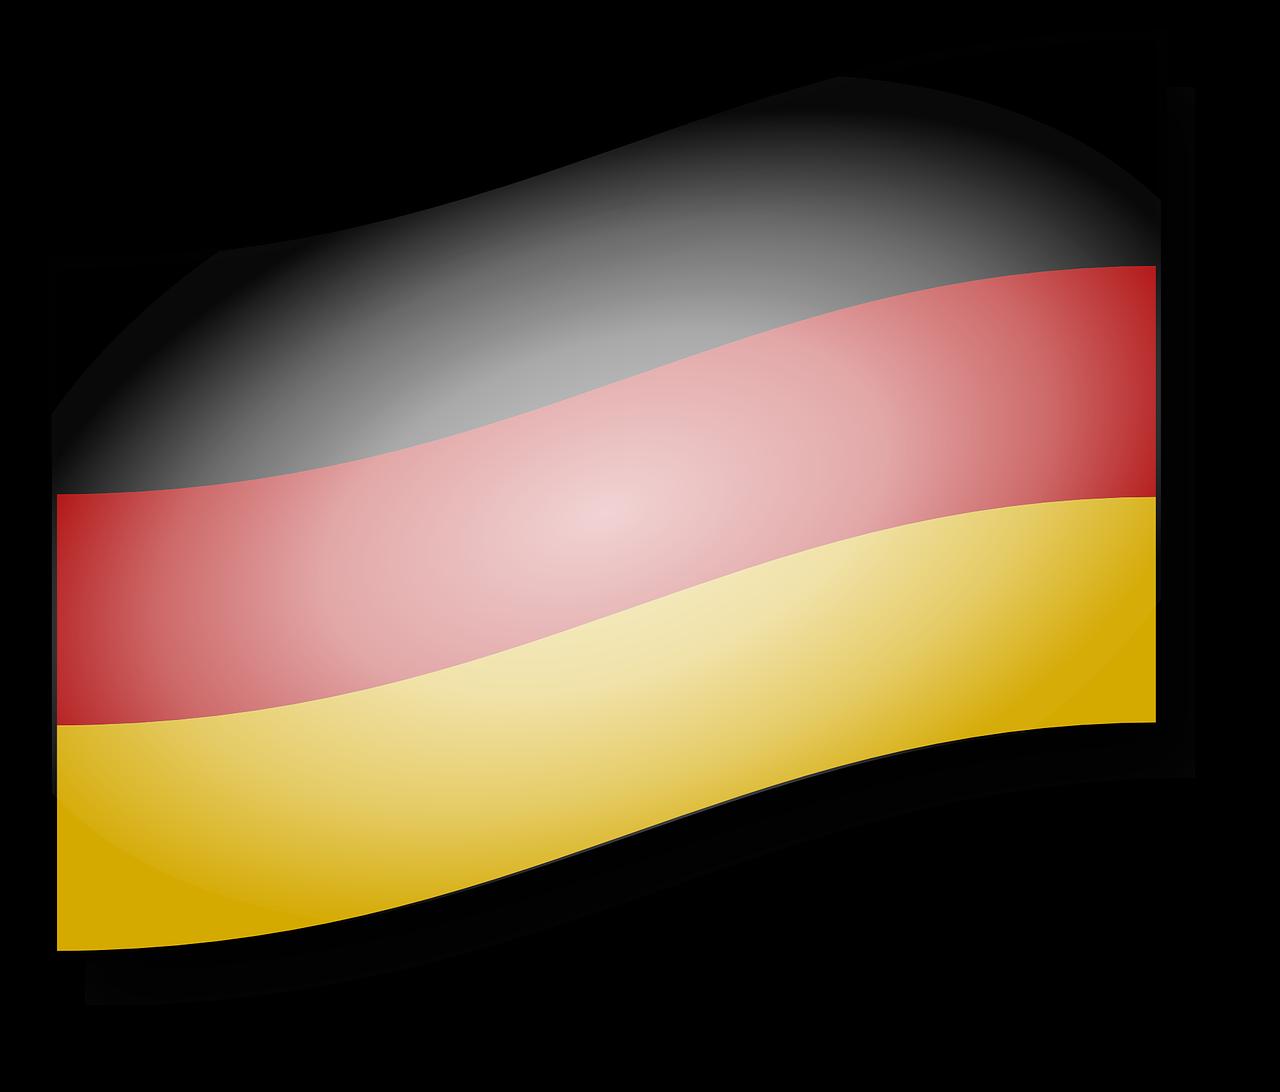 Флаг германии рисунок, картинках